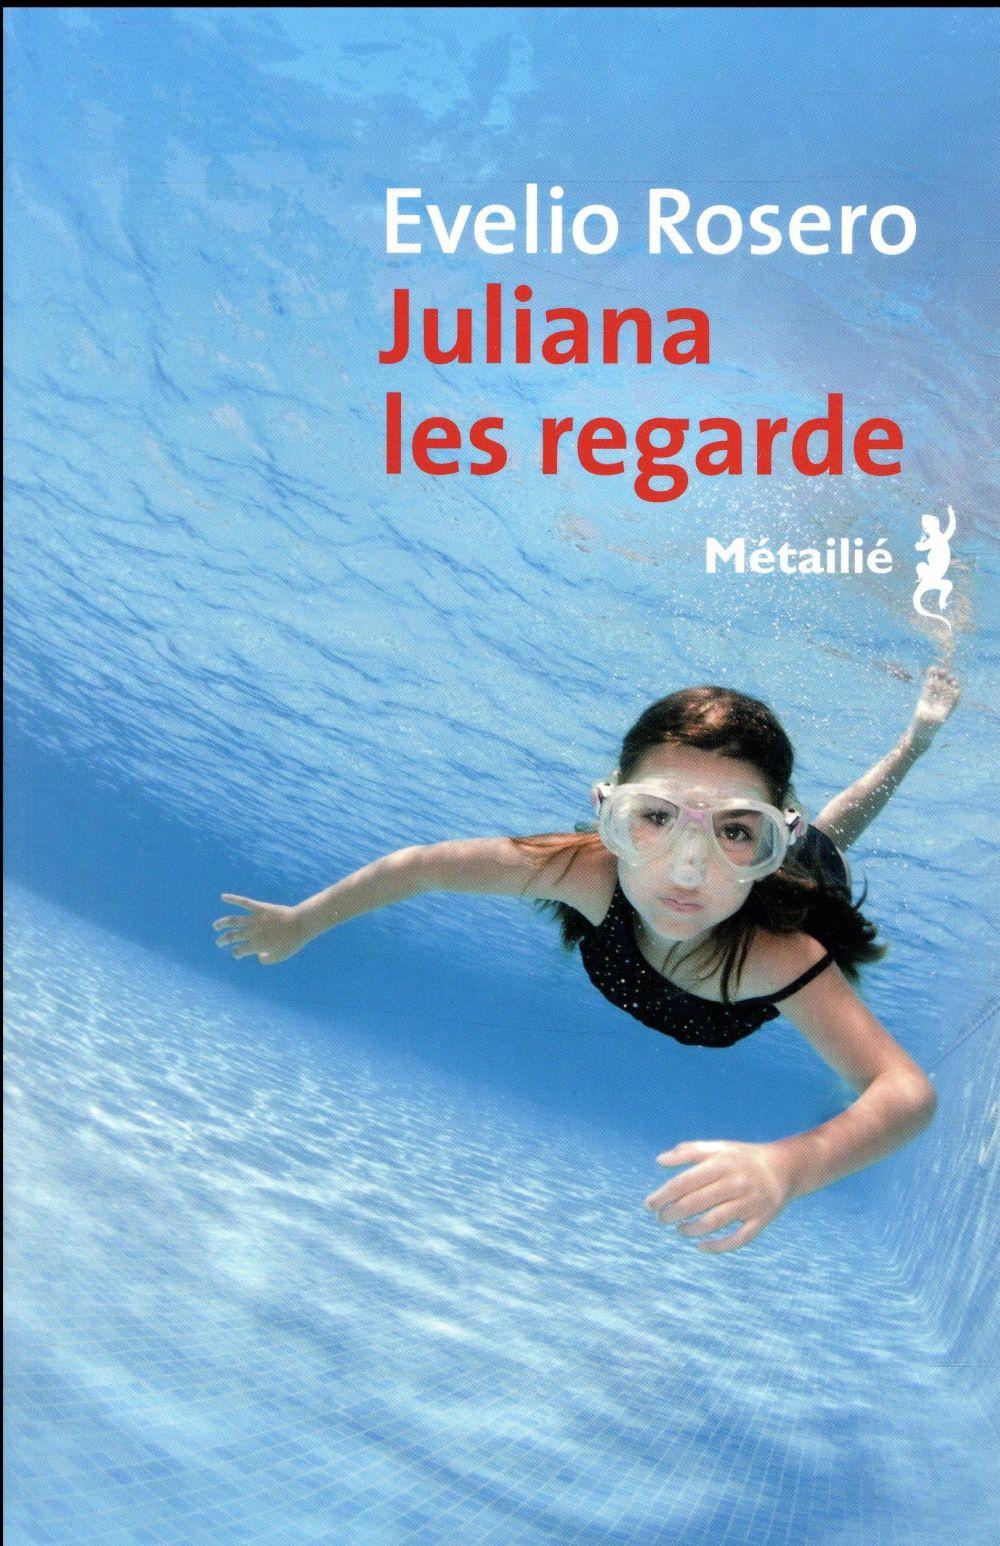 JULIANA LES REGARDE